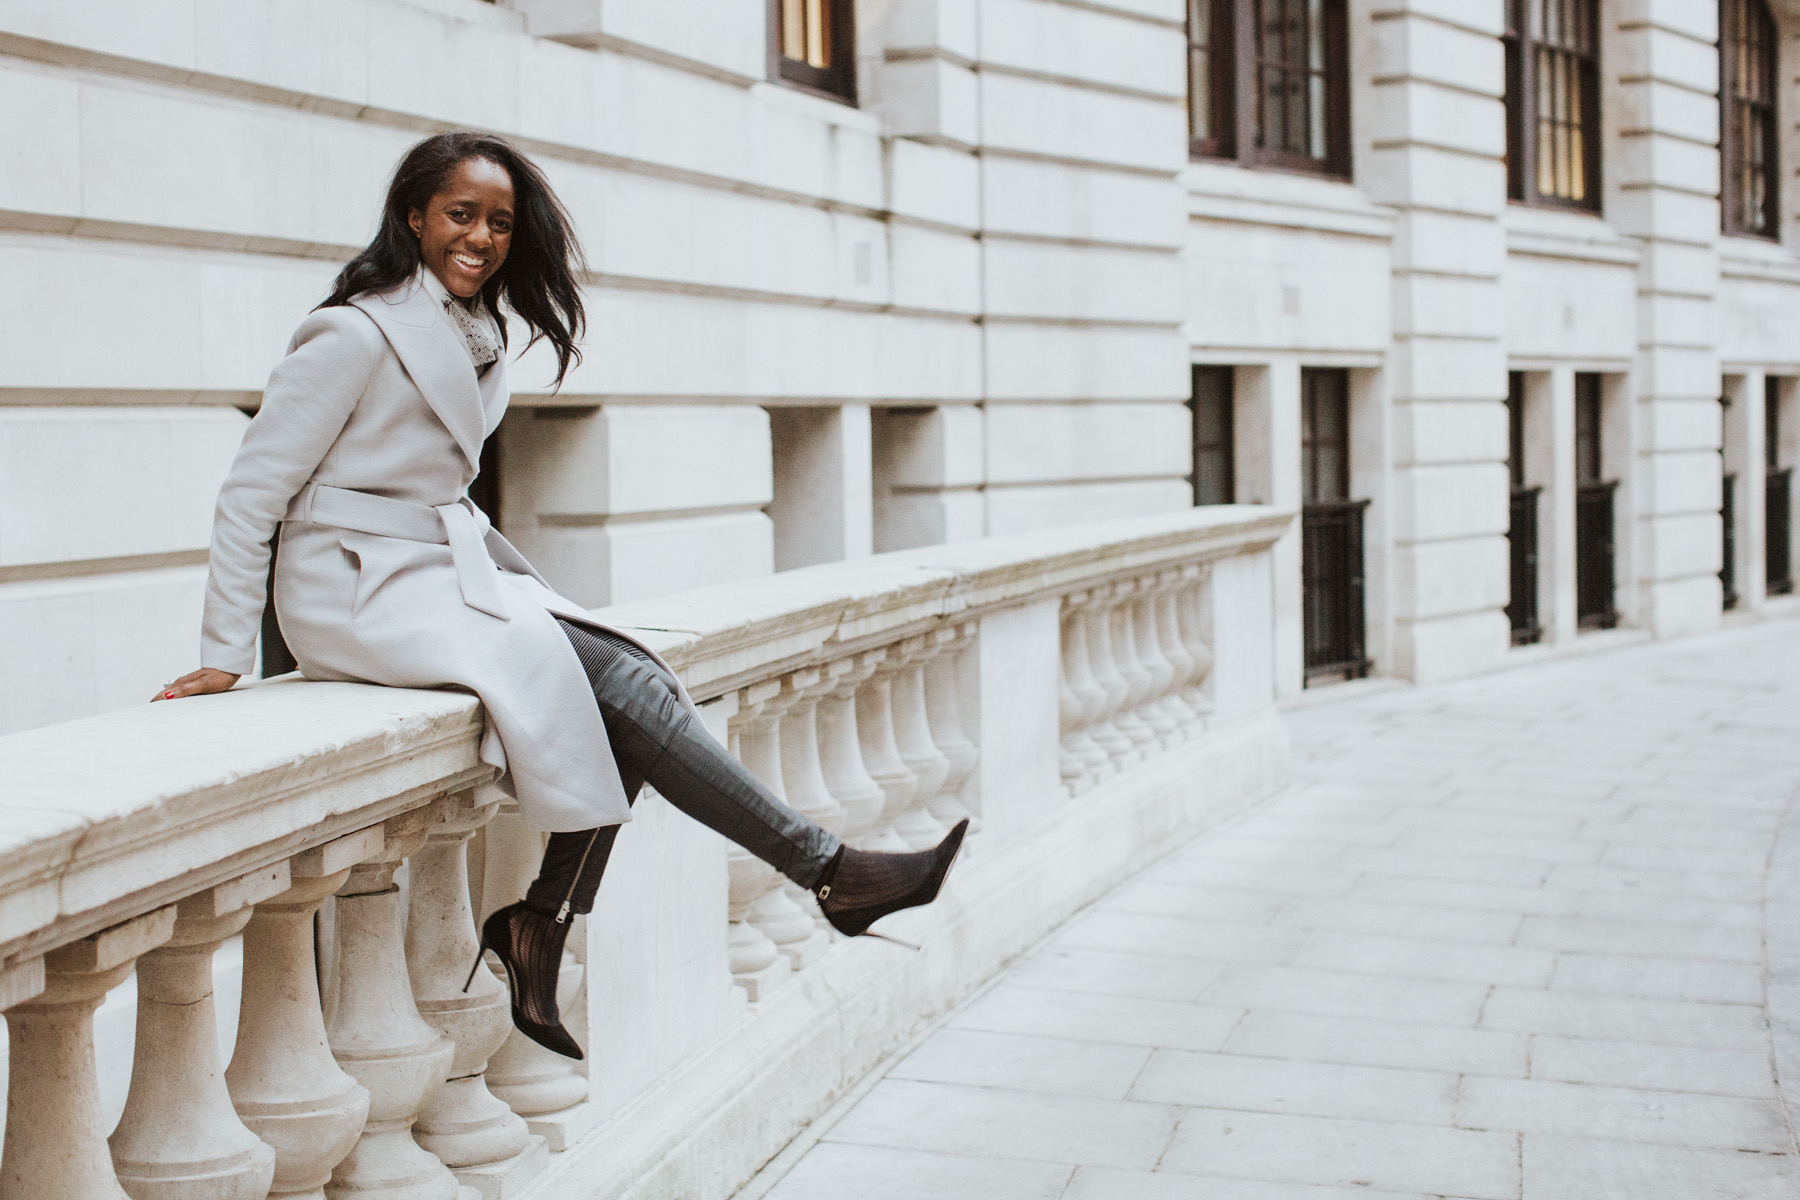 020-London-portrait-photography-LucyWilliamsPhotography.jpg